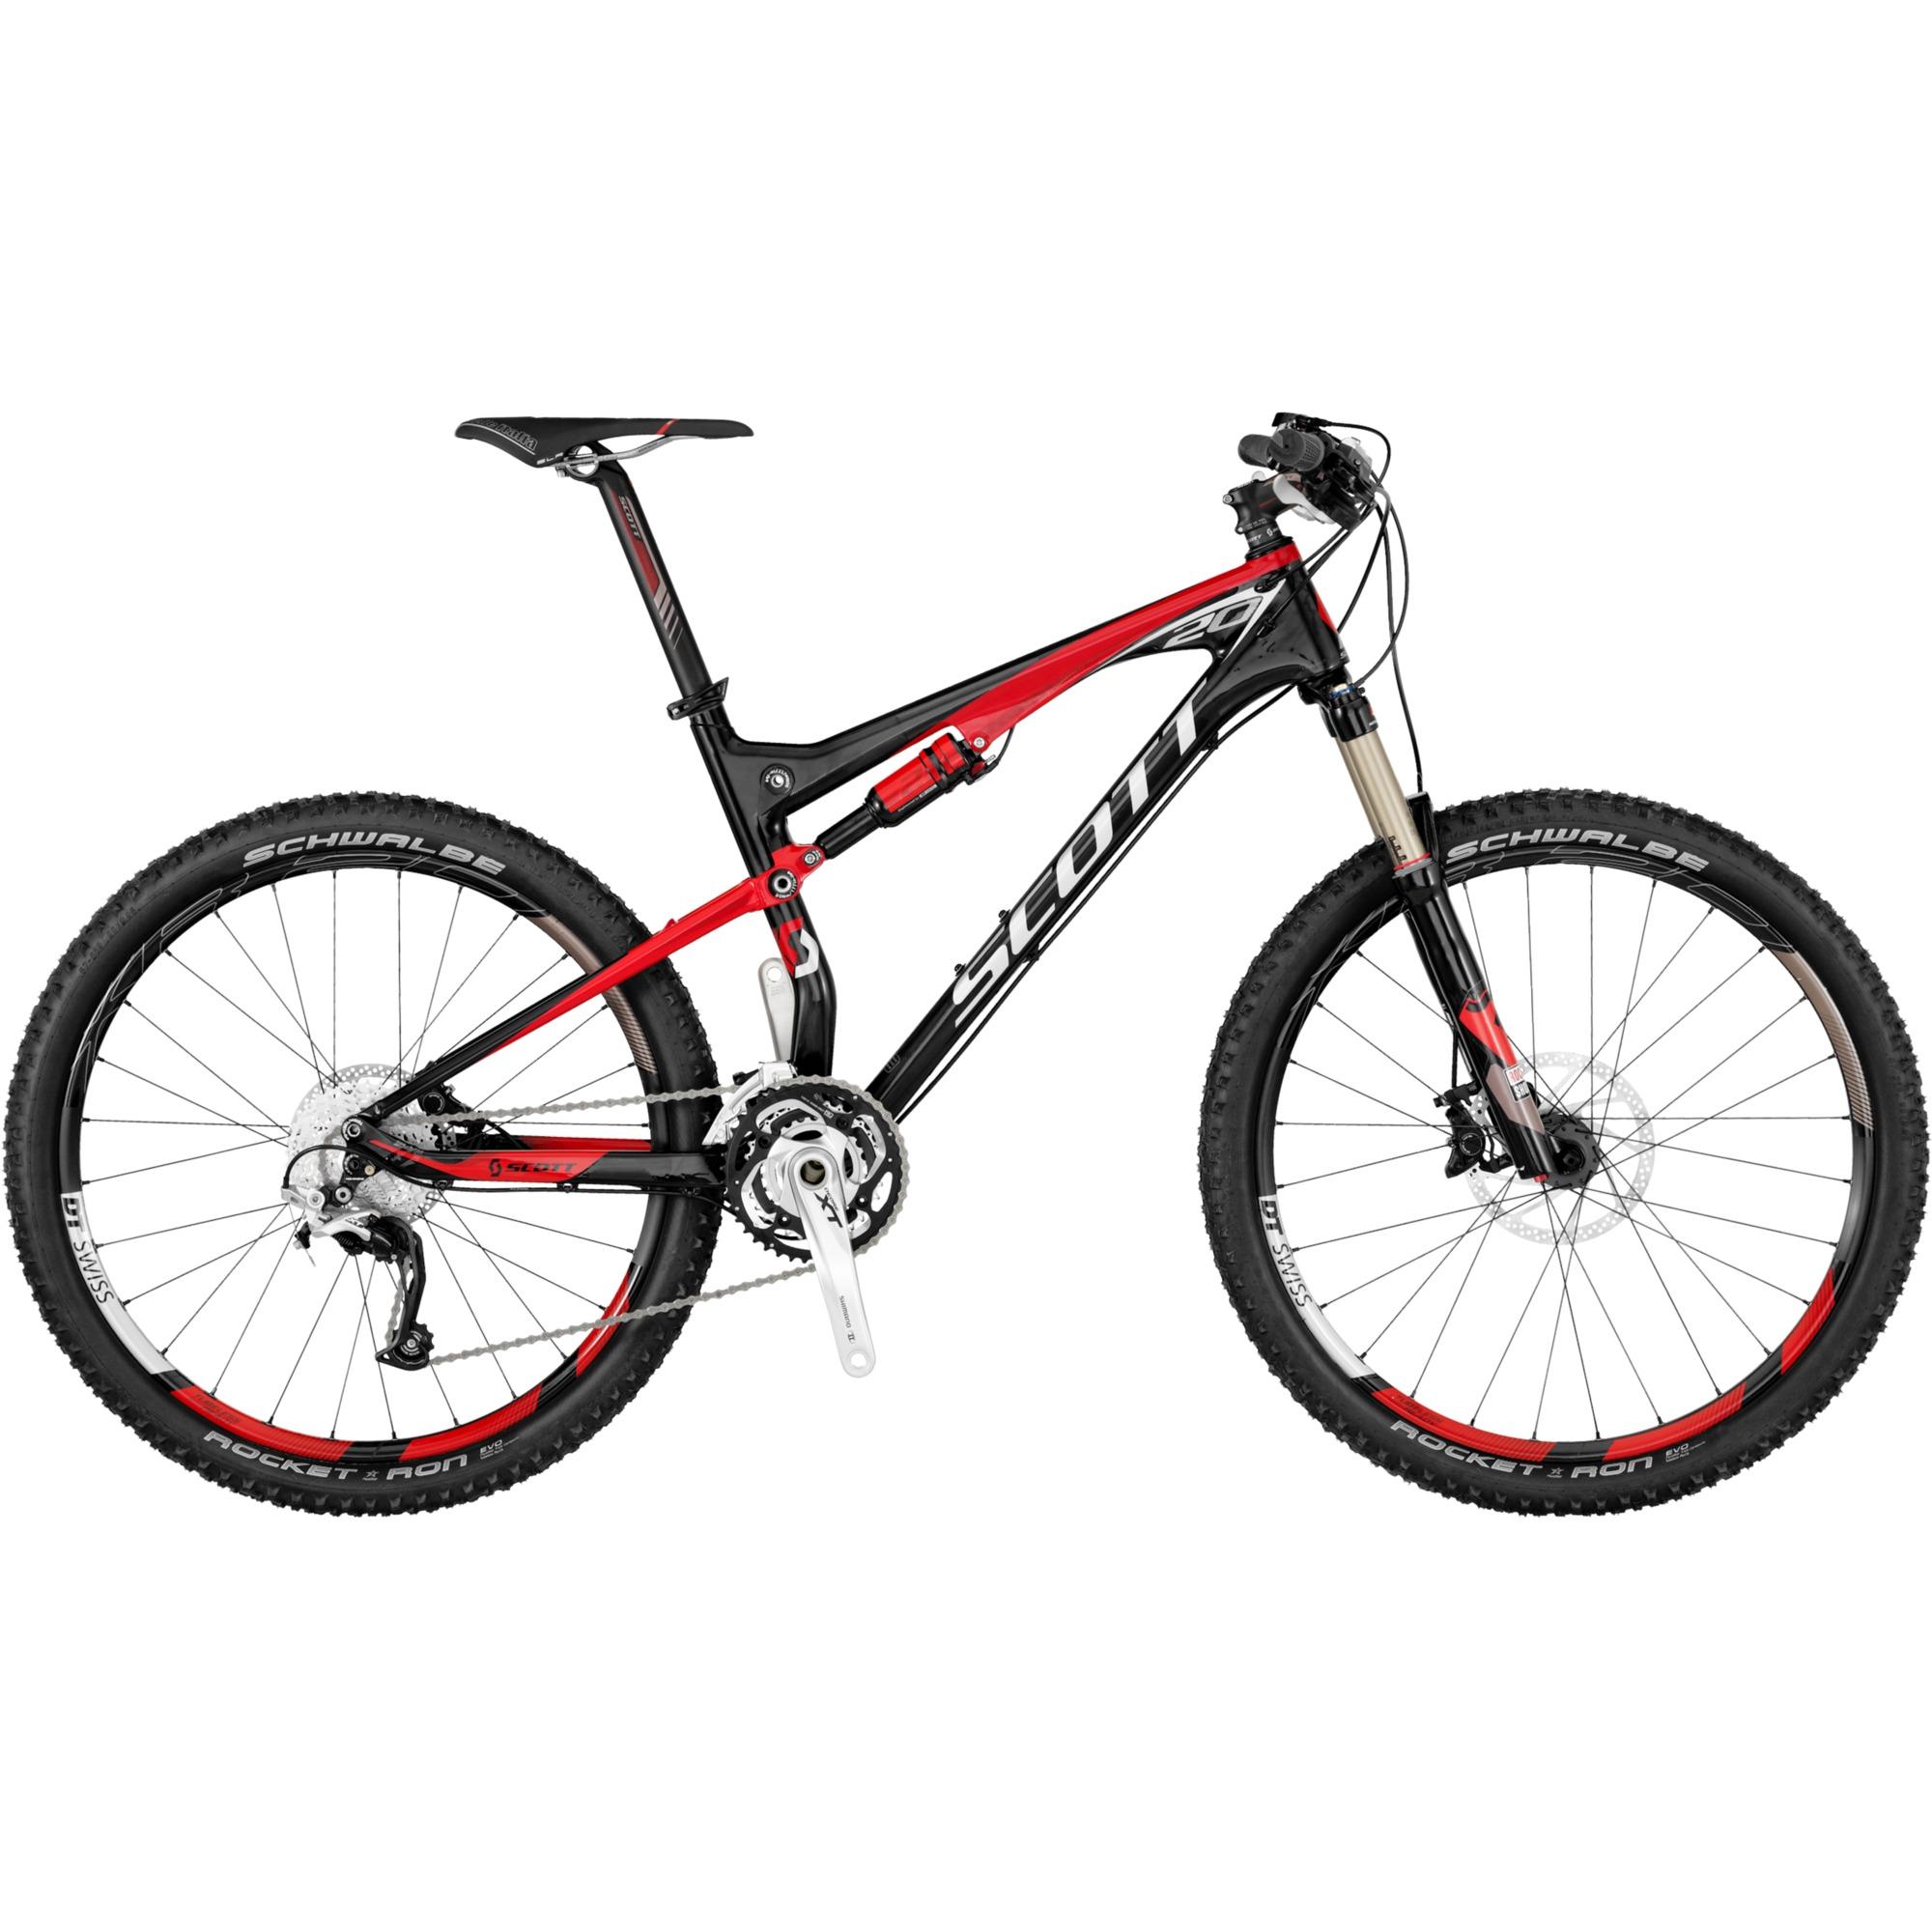 Scott Spark 20 Bike 2012